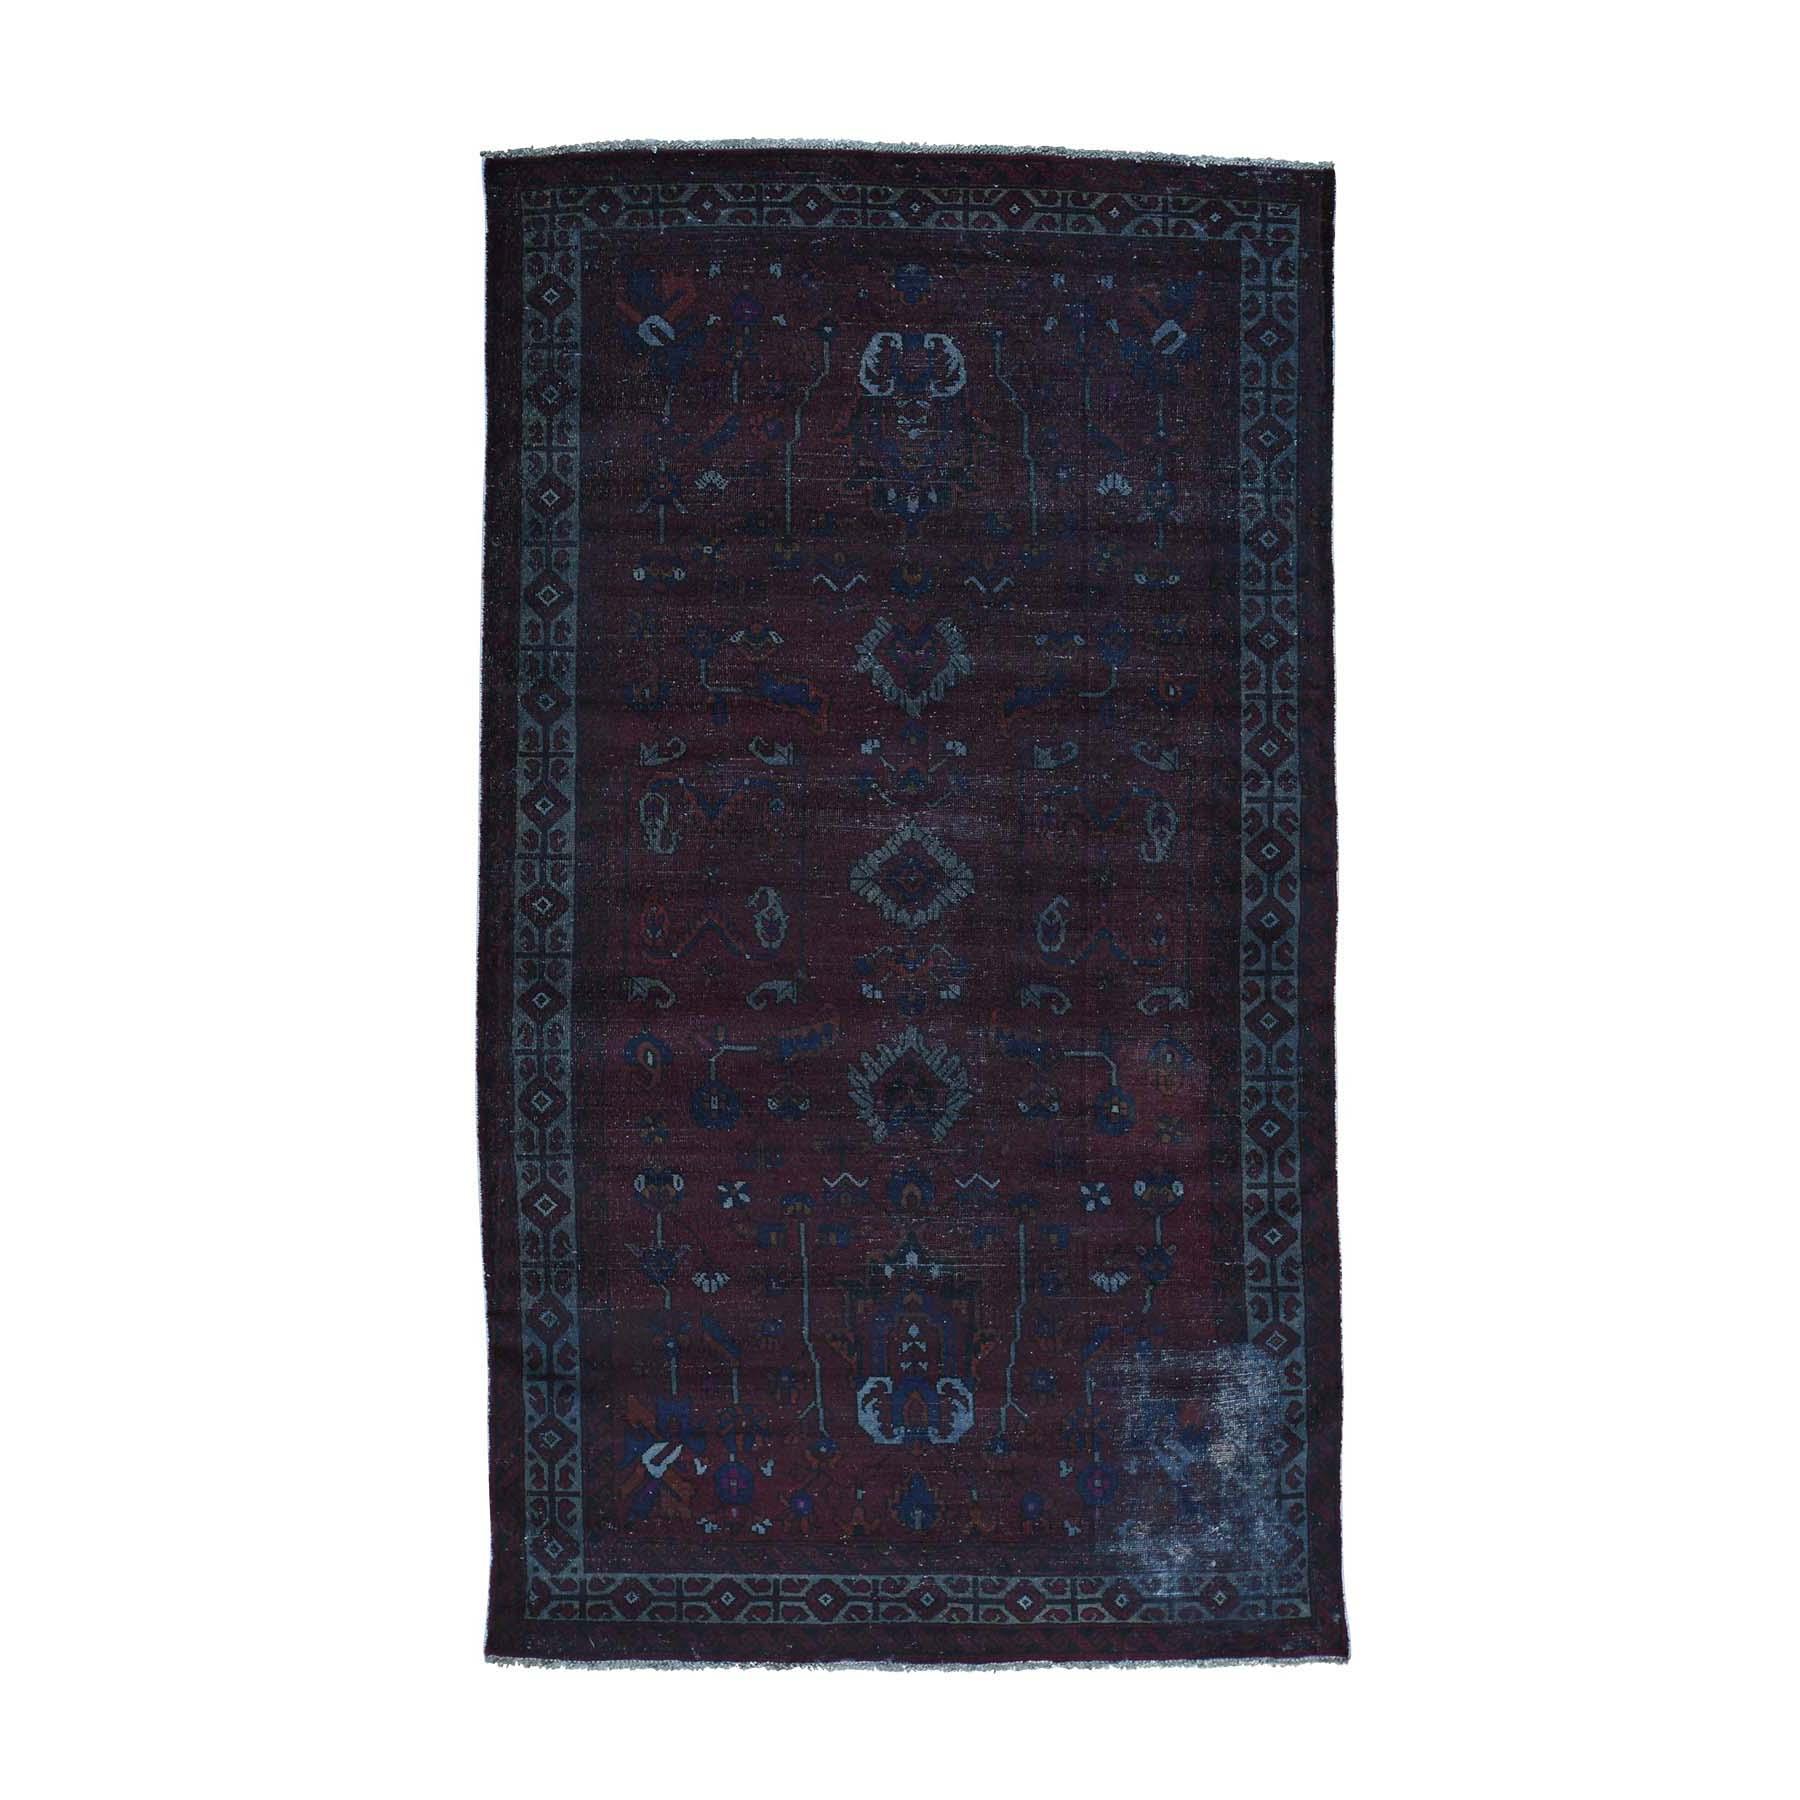 "5'4""X9'5"" Handmade Gallery Size Overdyed Persian Qashqai Vintage Rug moac06bd"